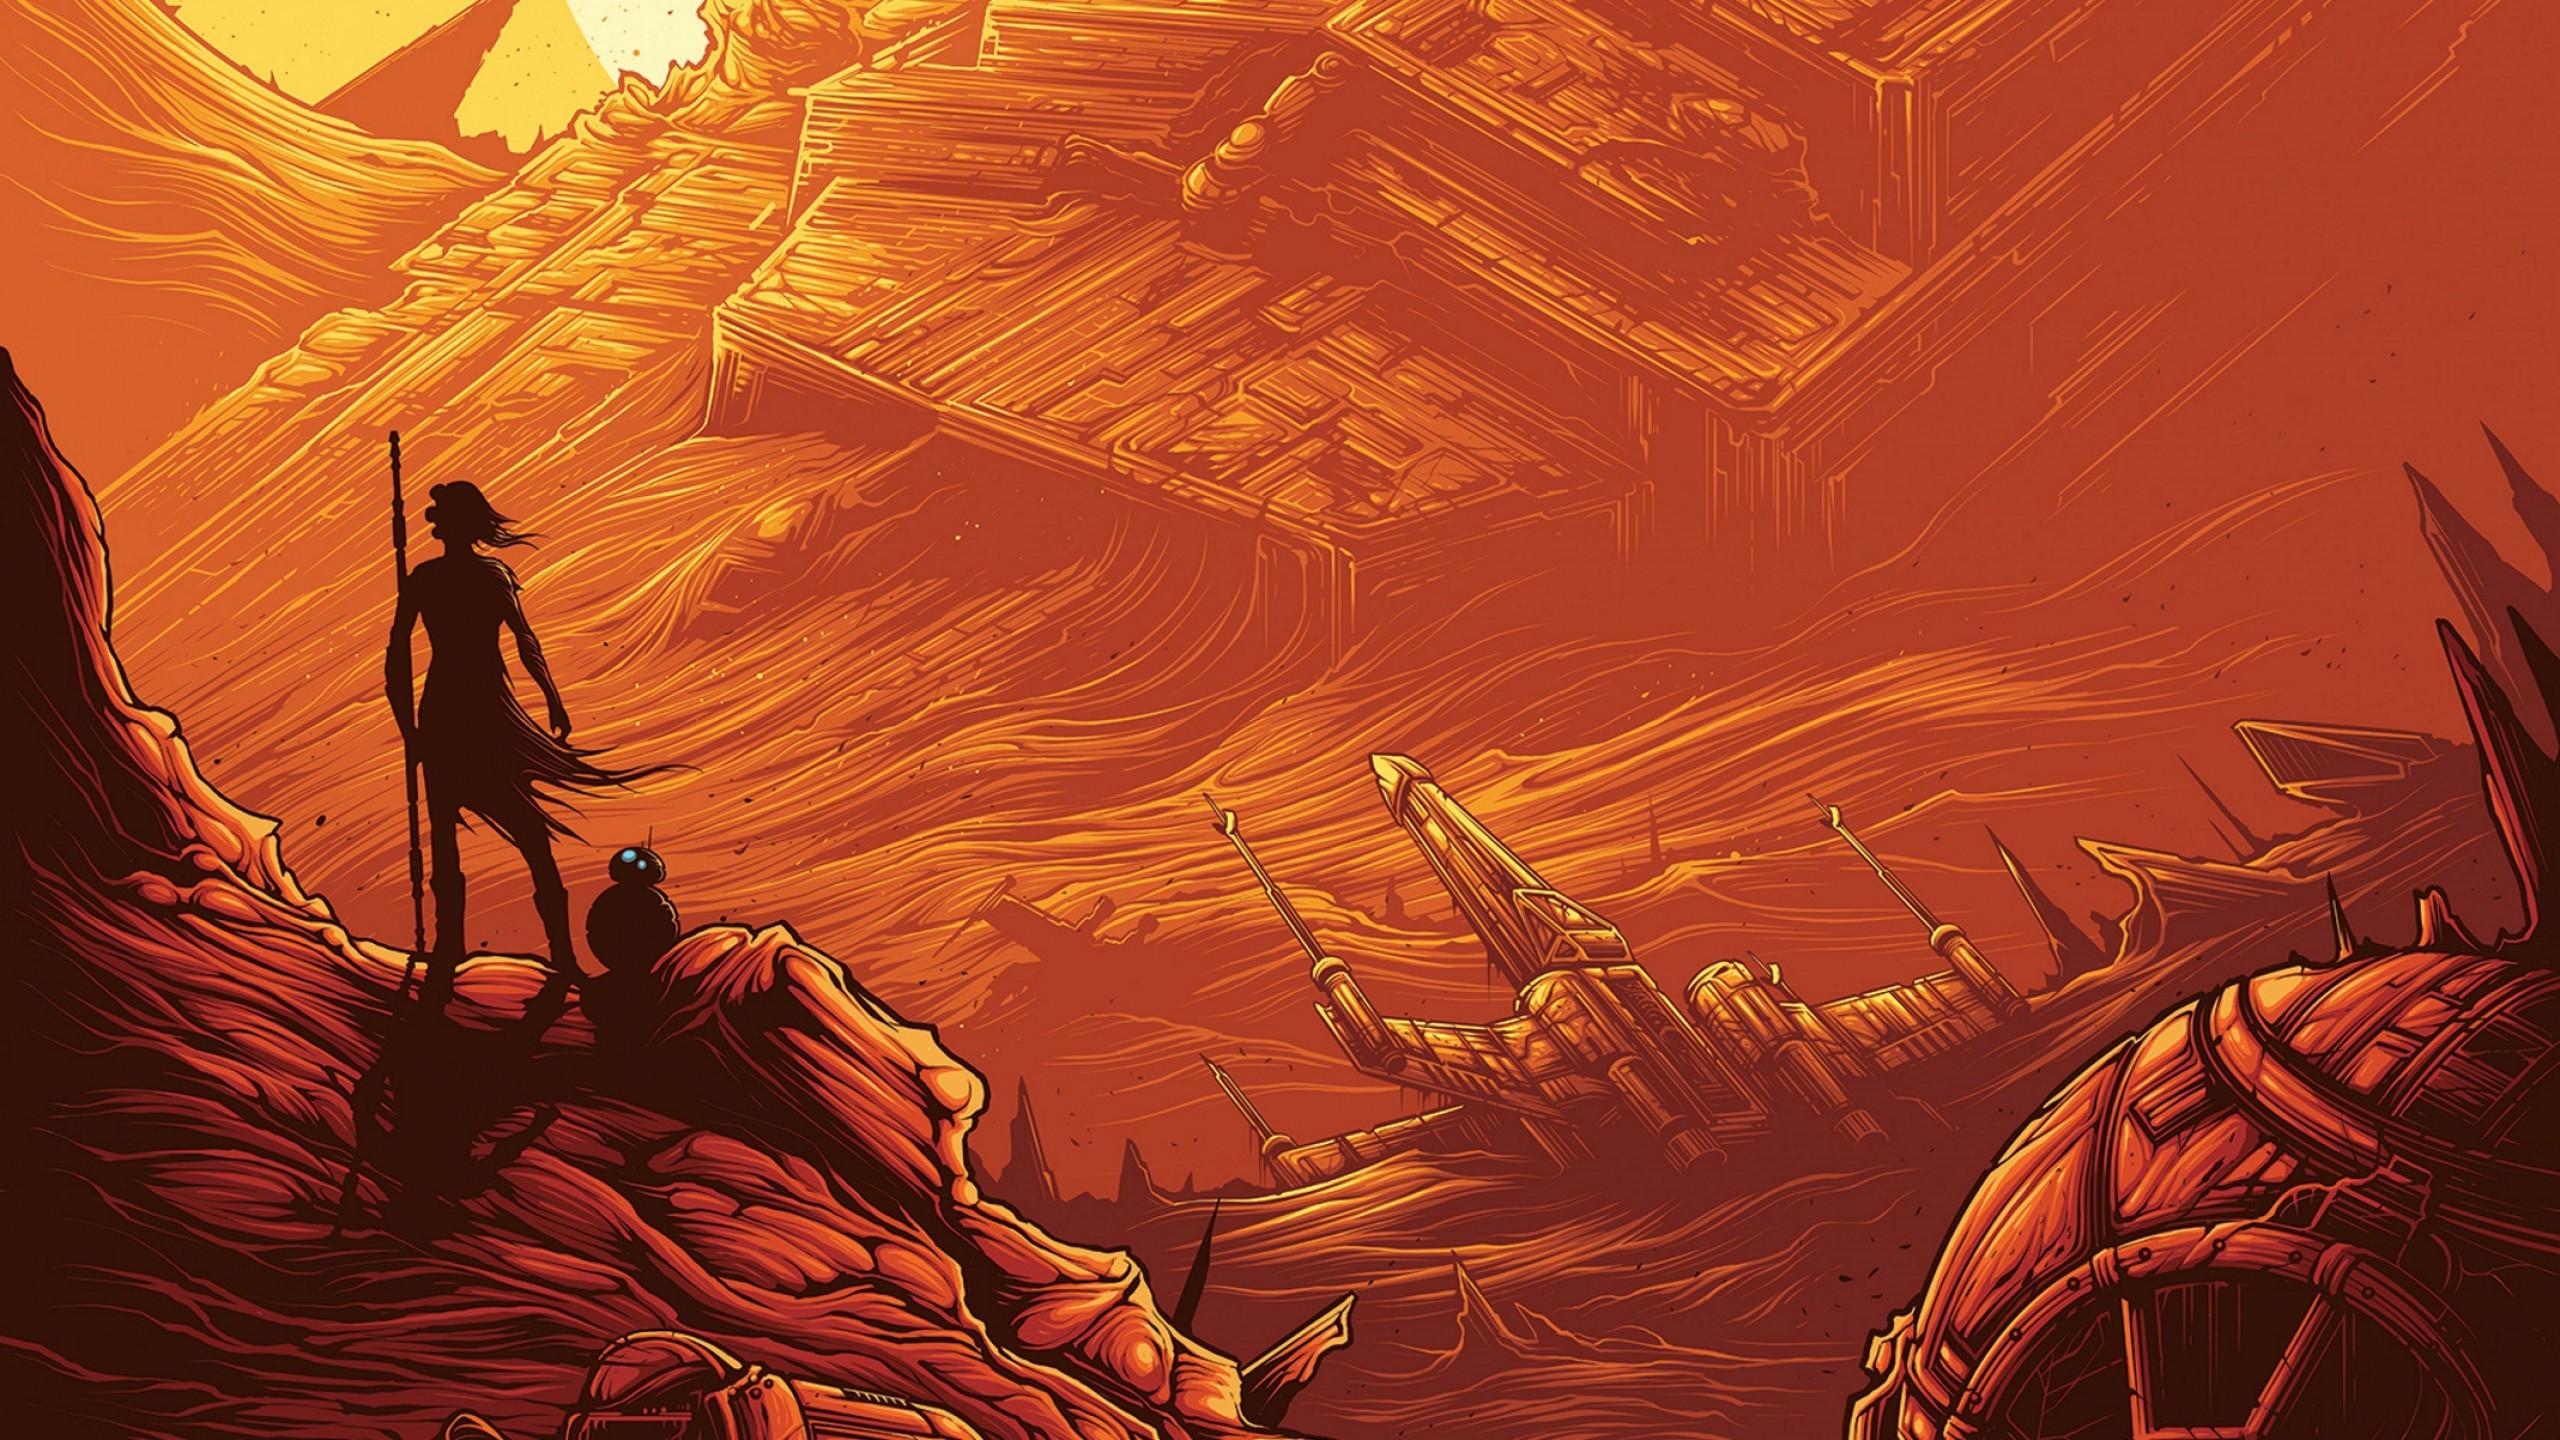 Movies / Star Wars Wallpaper